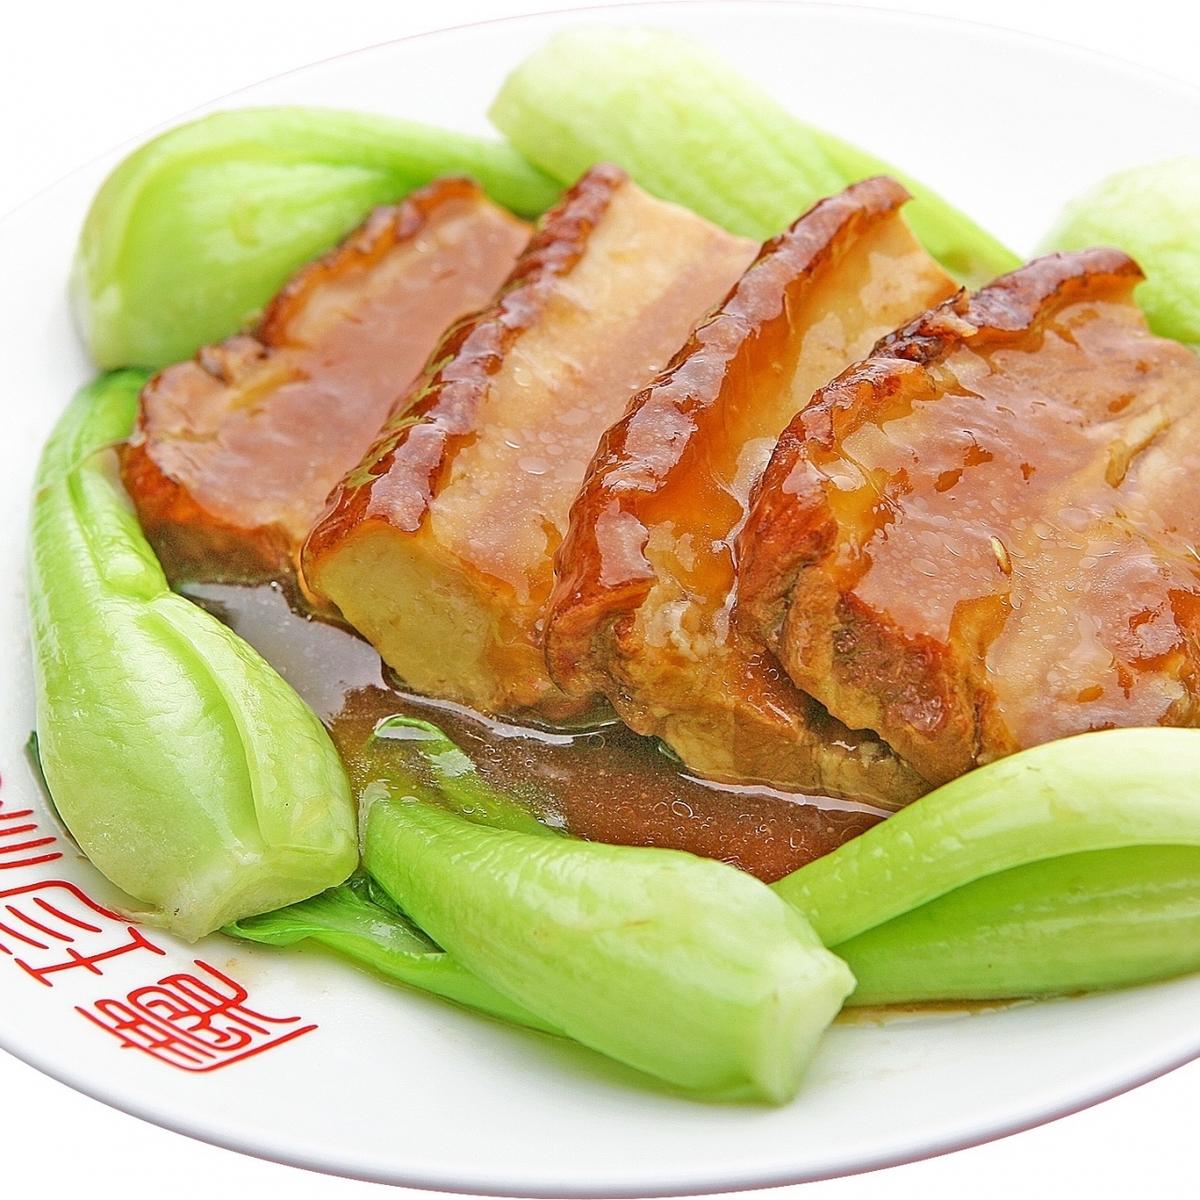 Simmered pork belly sauce